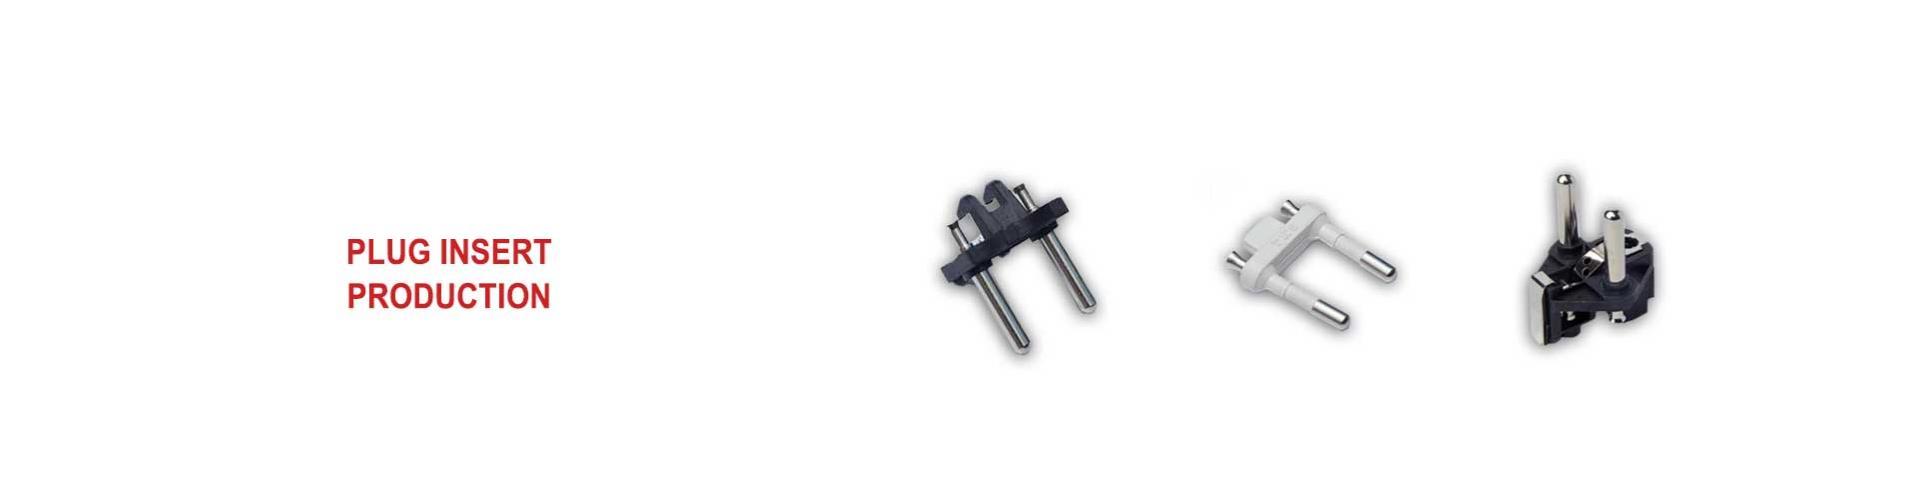 Plug Insert Production